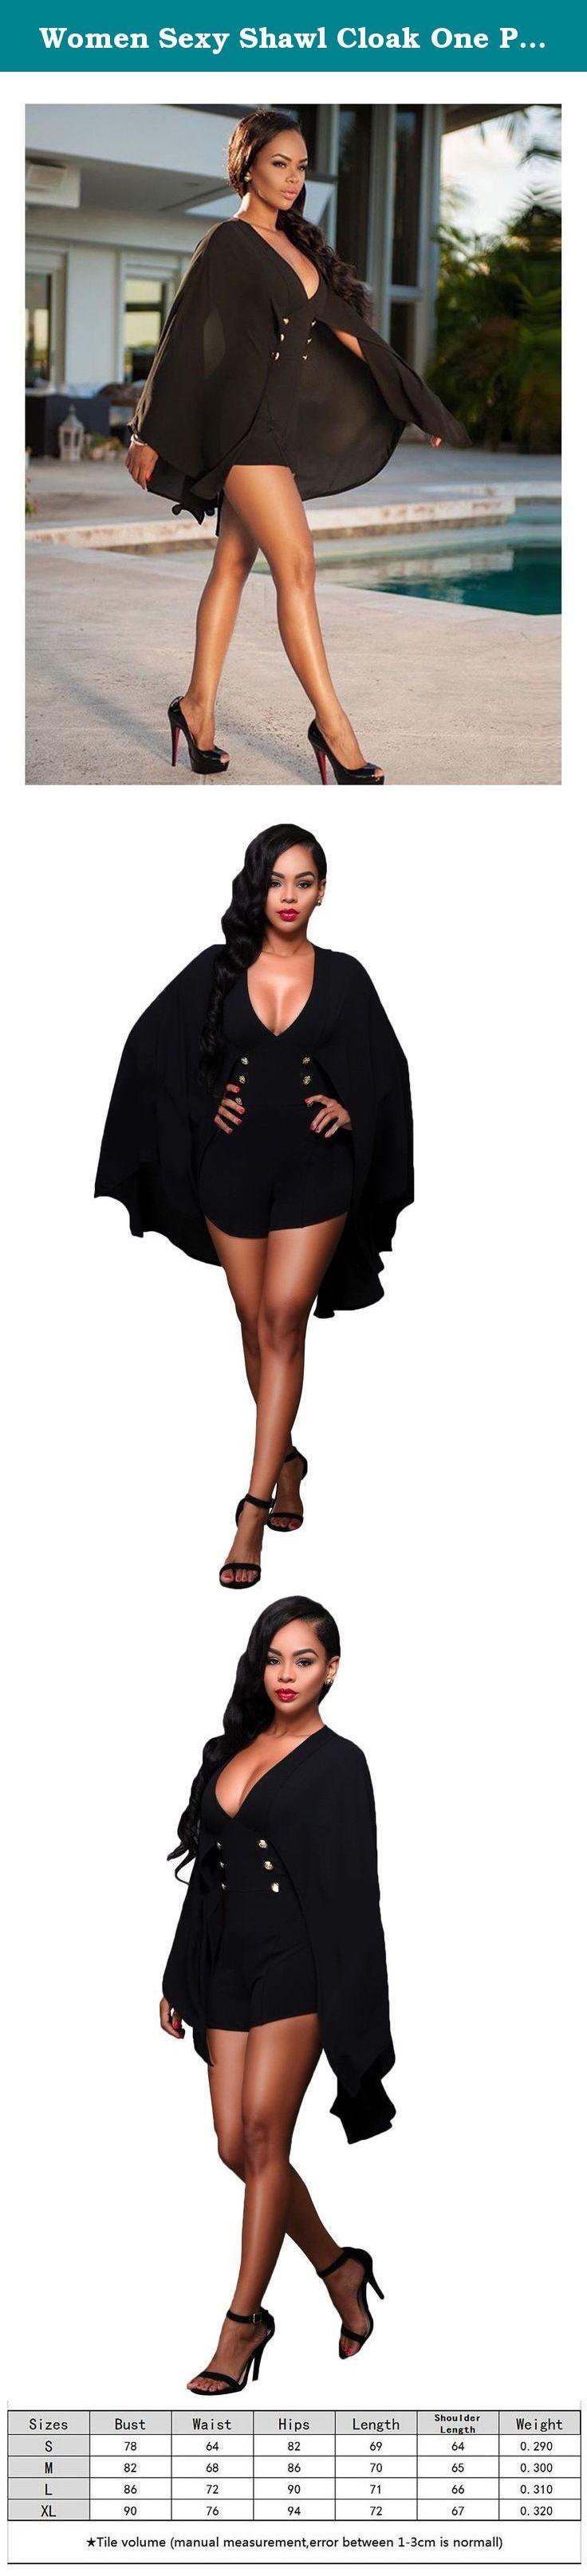 00fbe3fcd709 Women Sexy Shawl Cloak One Piece Jumpsuit Shorts Rompers Clubwear Black XL.  Fair Warning